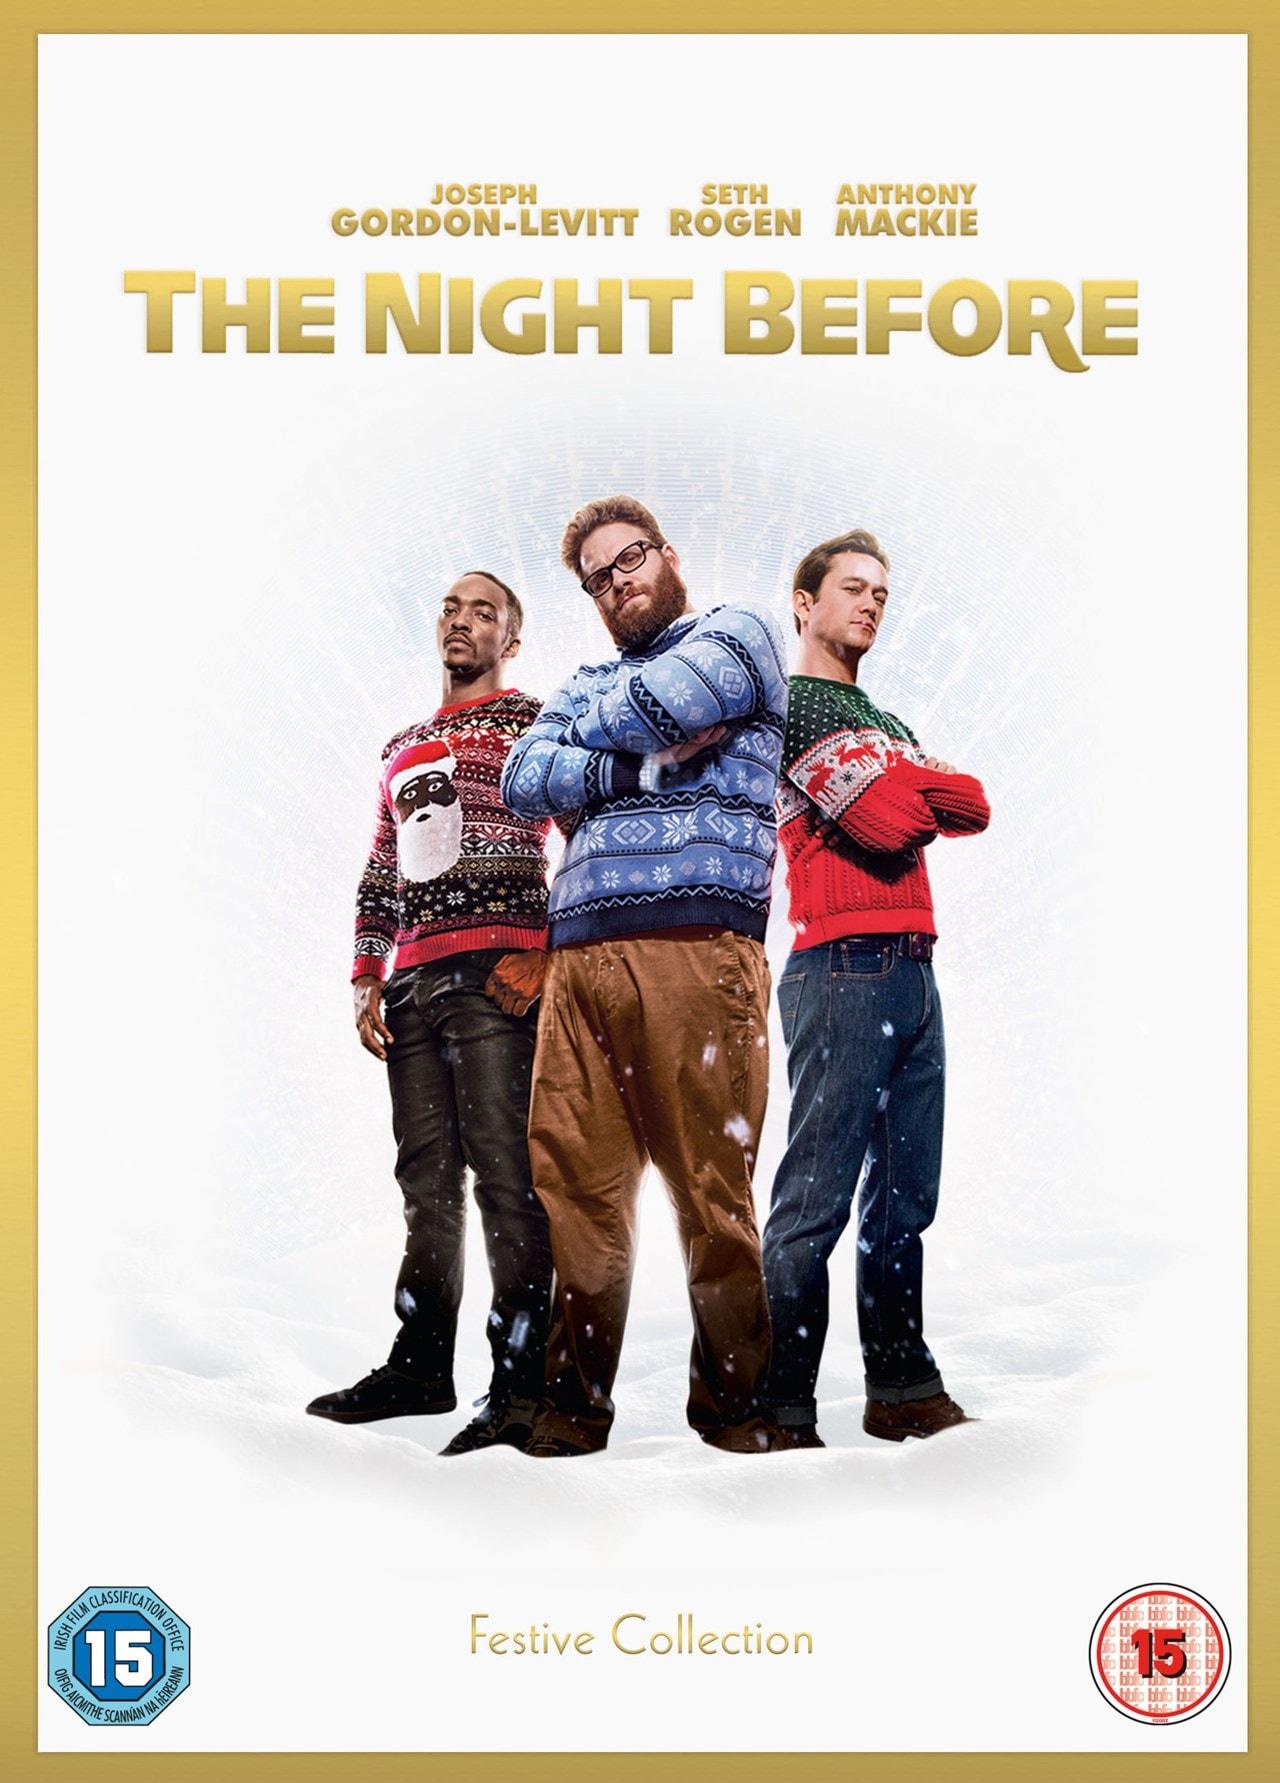 The Night Before (hmv Christmas Classics) - 1